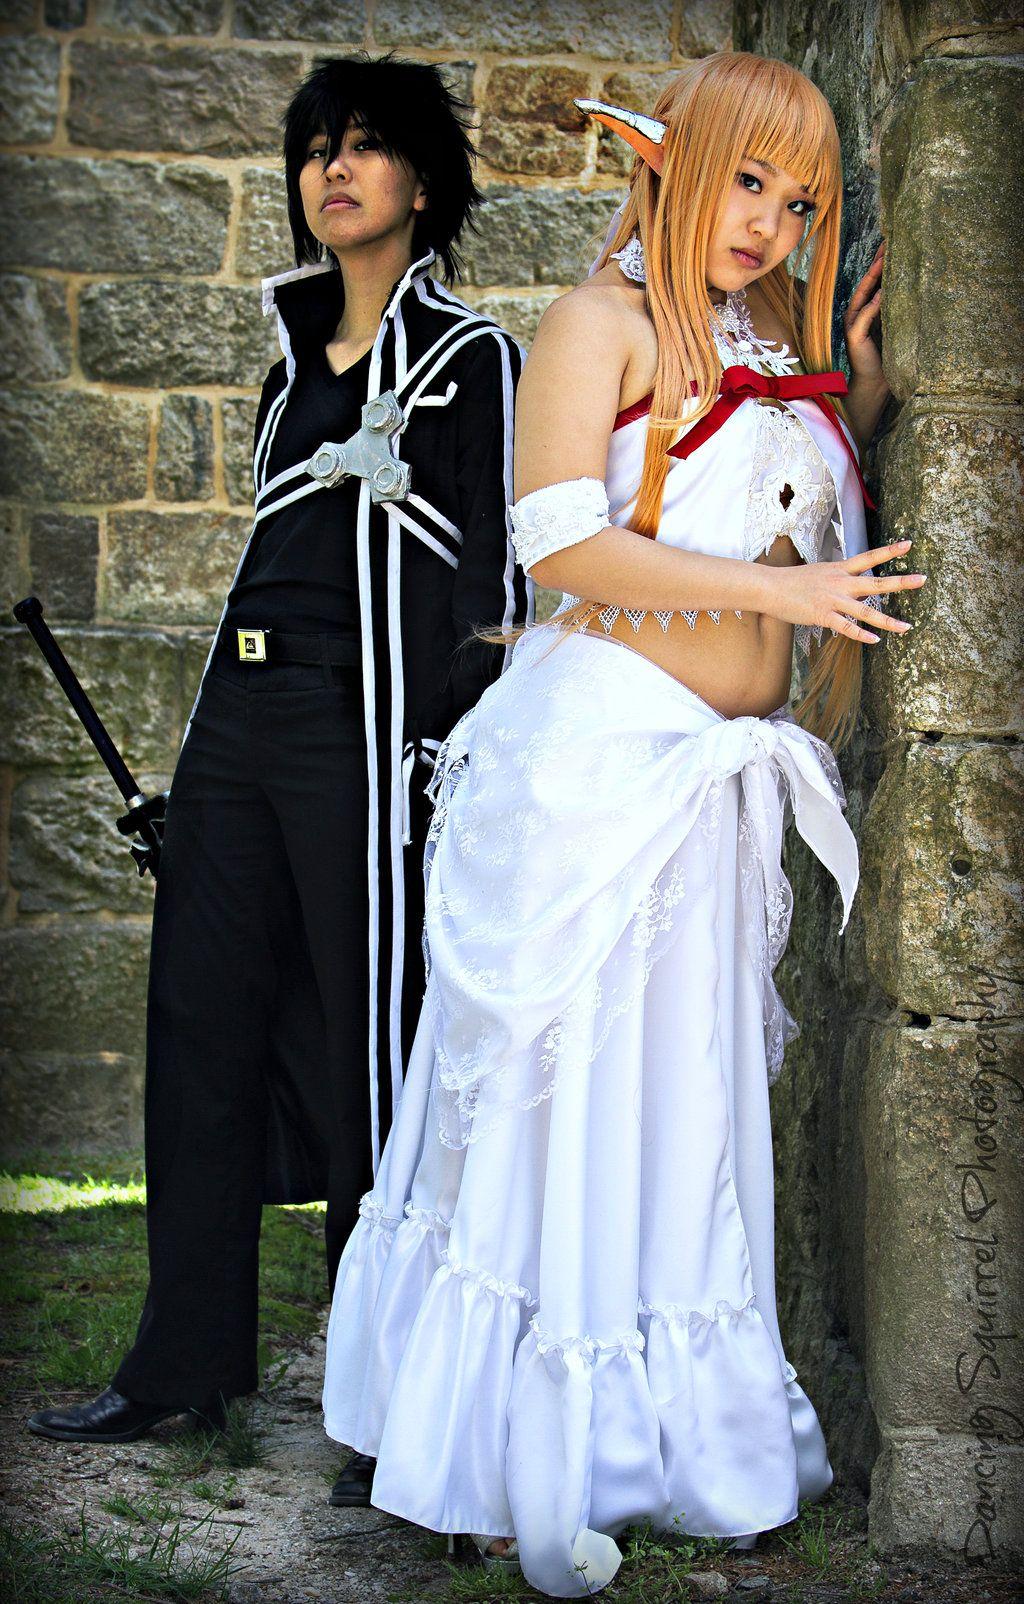 Yuuki Asuna and Kirigaya Kazuto - Sword Art Online by Dancing-Squirrel.deviantart.com on @deviantART